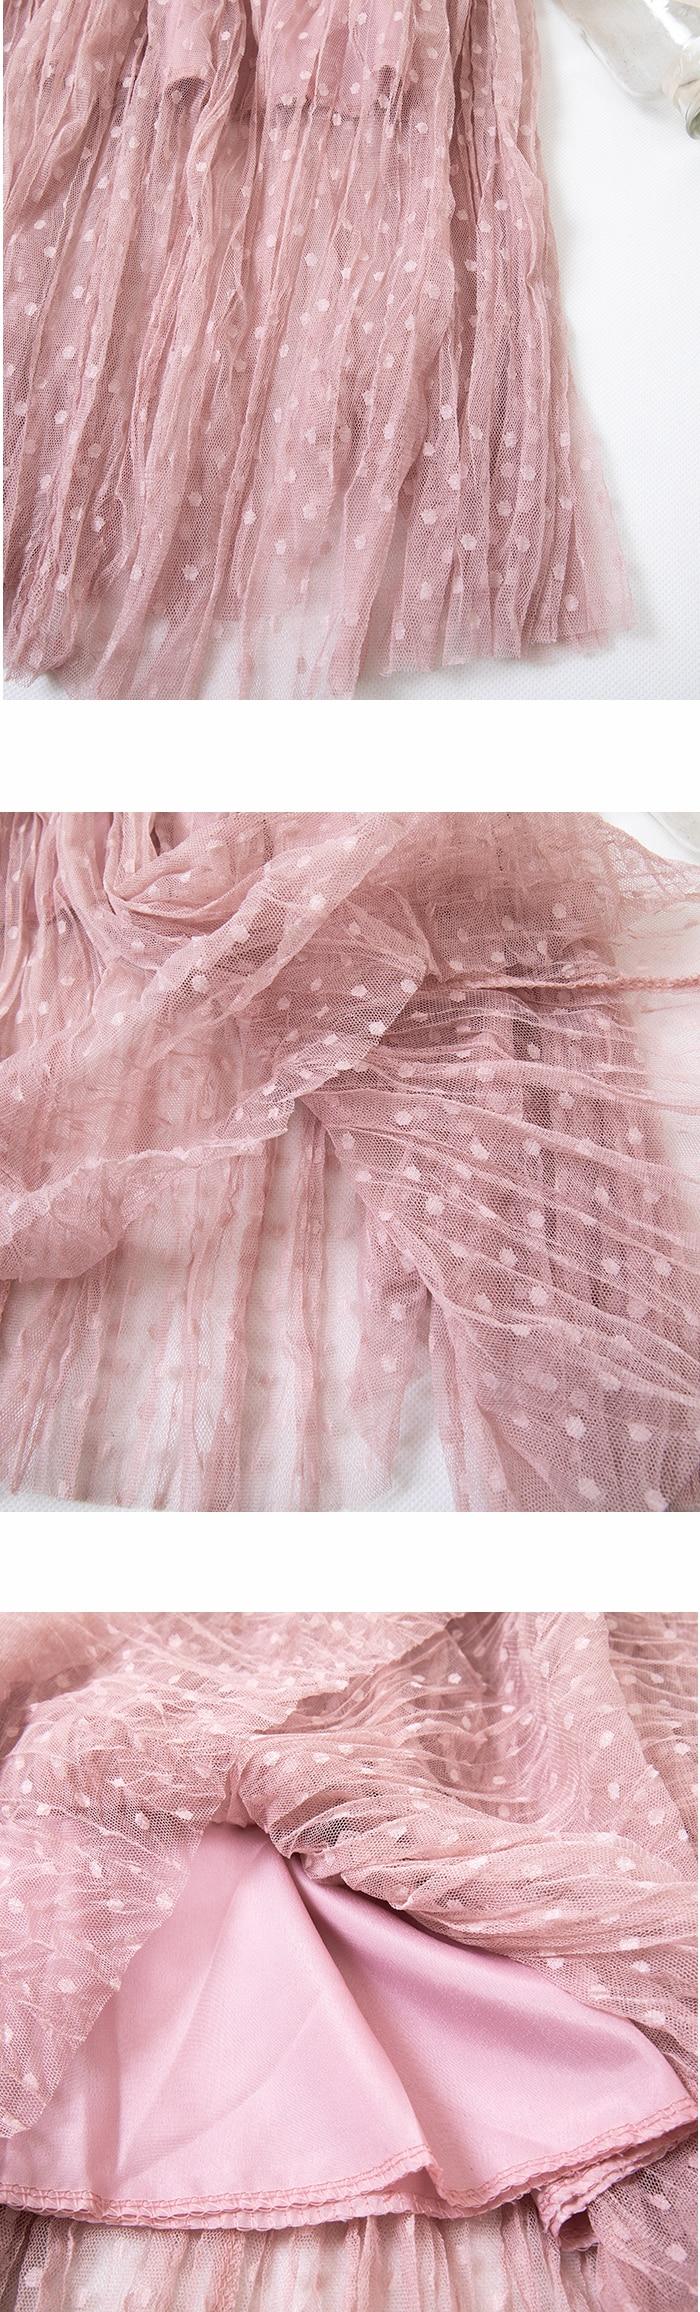 Autumn And Winter Women's Skirt New High Waist Skirt Solid Color Mesh Skirt Female Long Section Loose Thin Folds Skirt Women 9